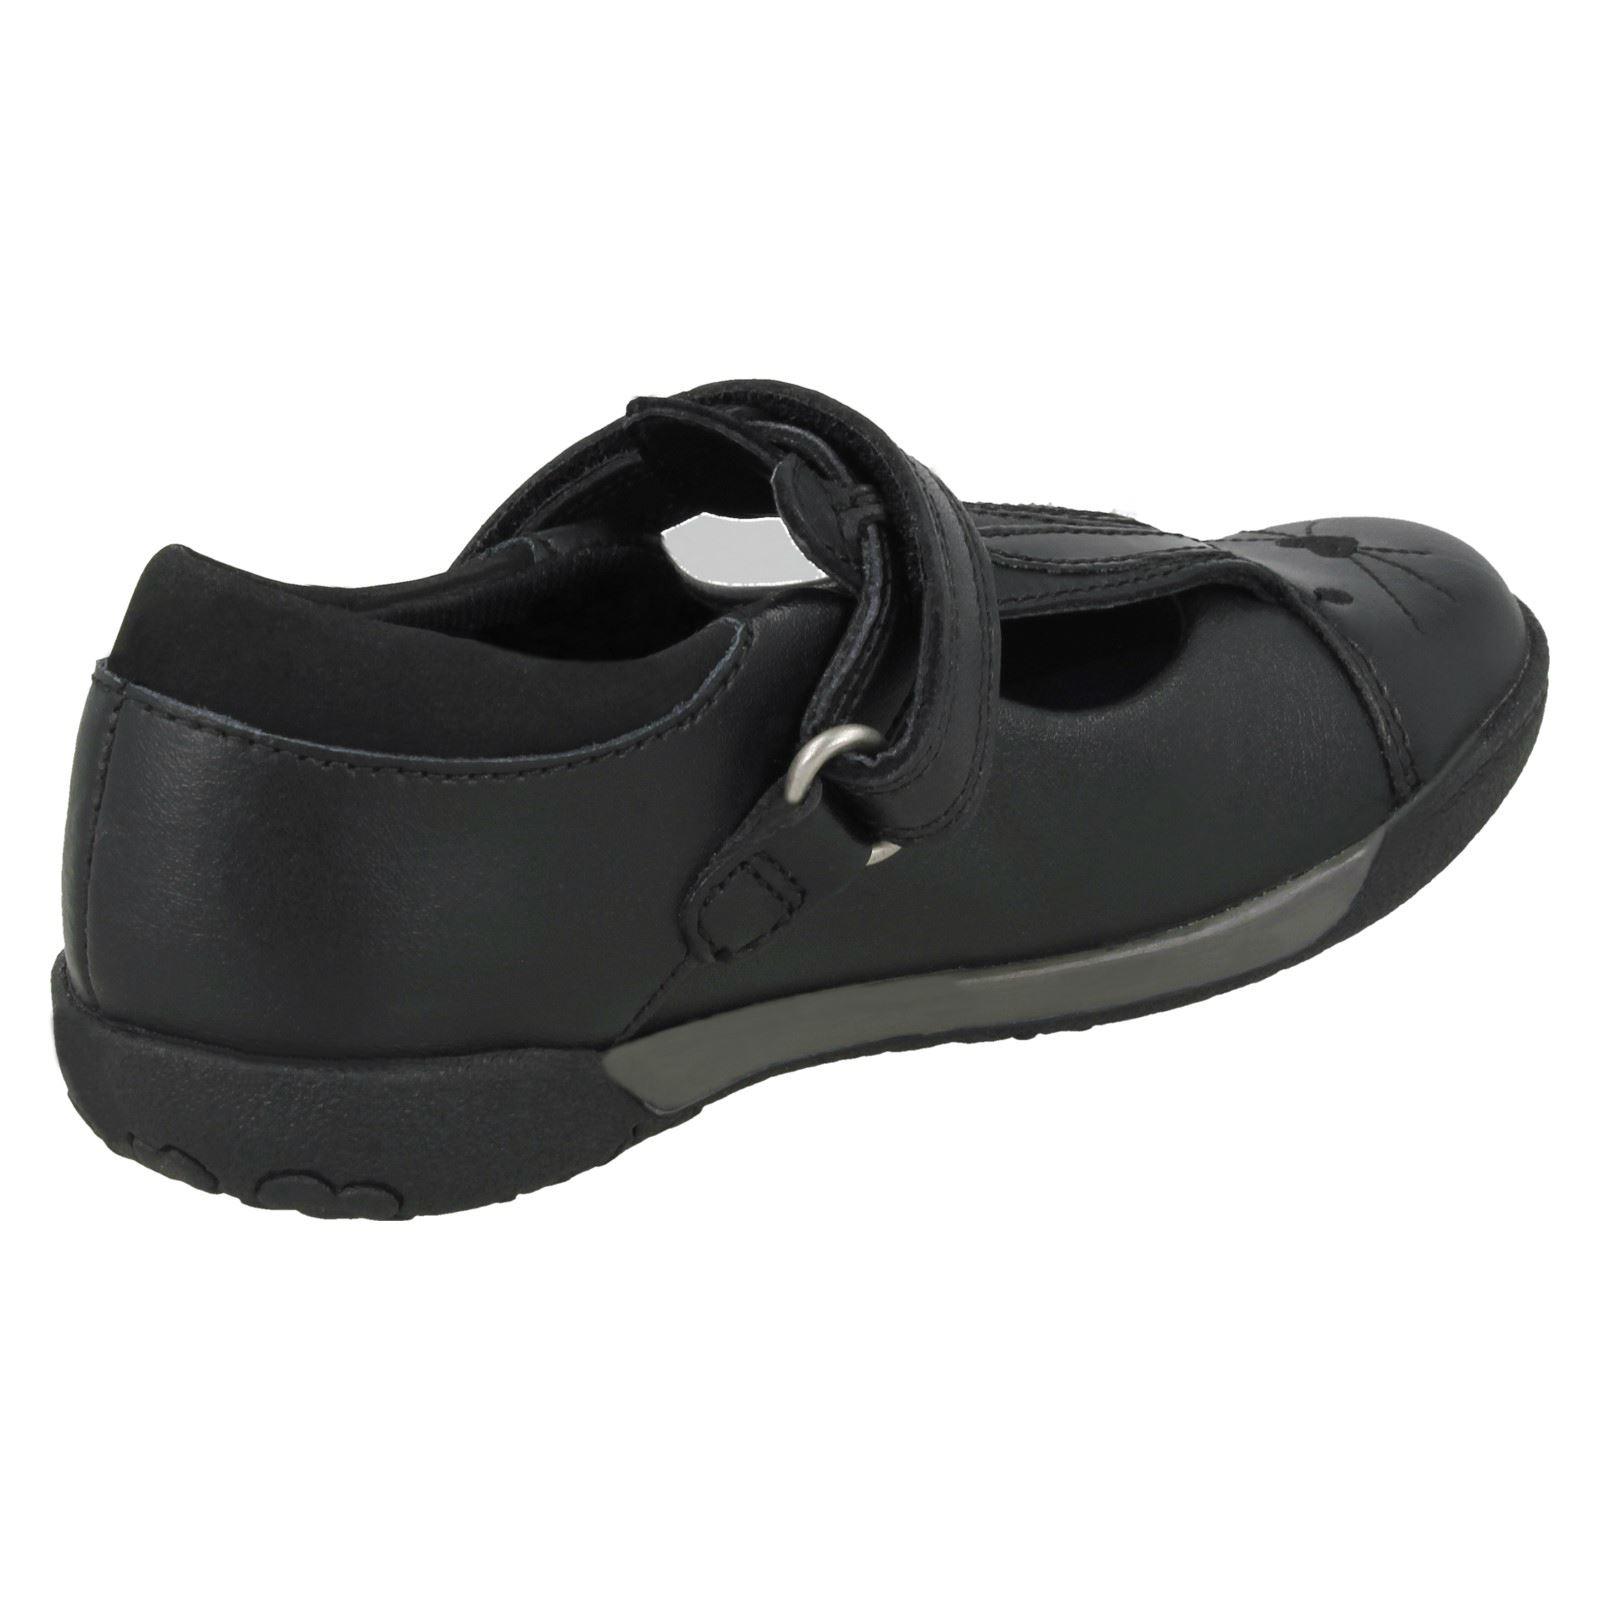 Clarks Girls School Shoes - Nibbles Jig